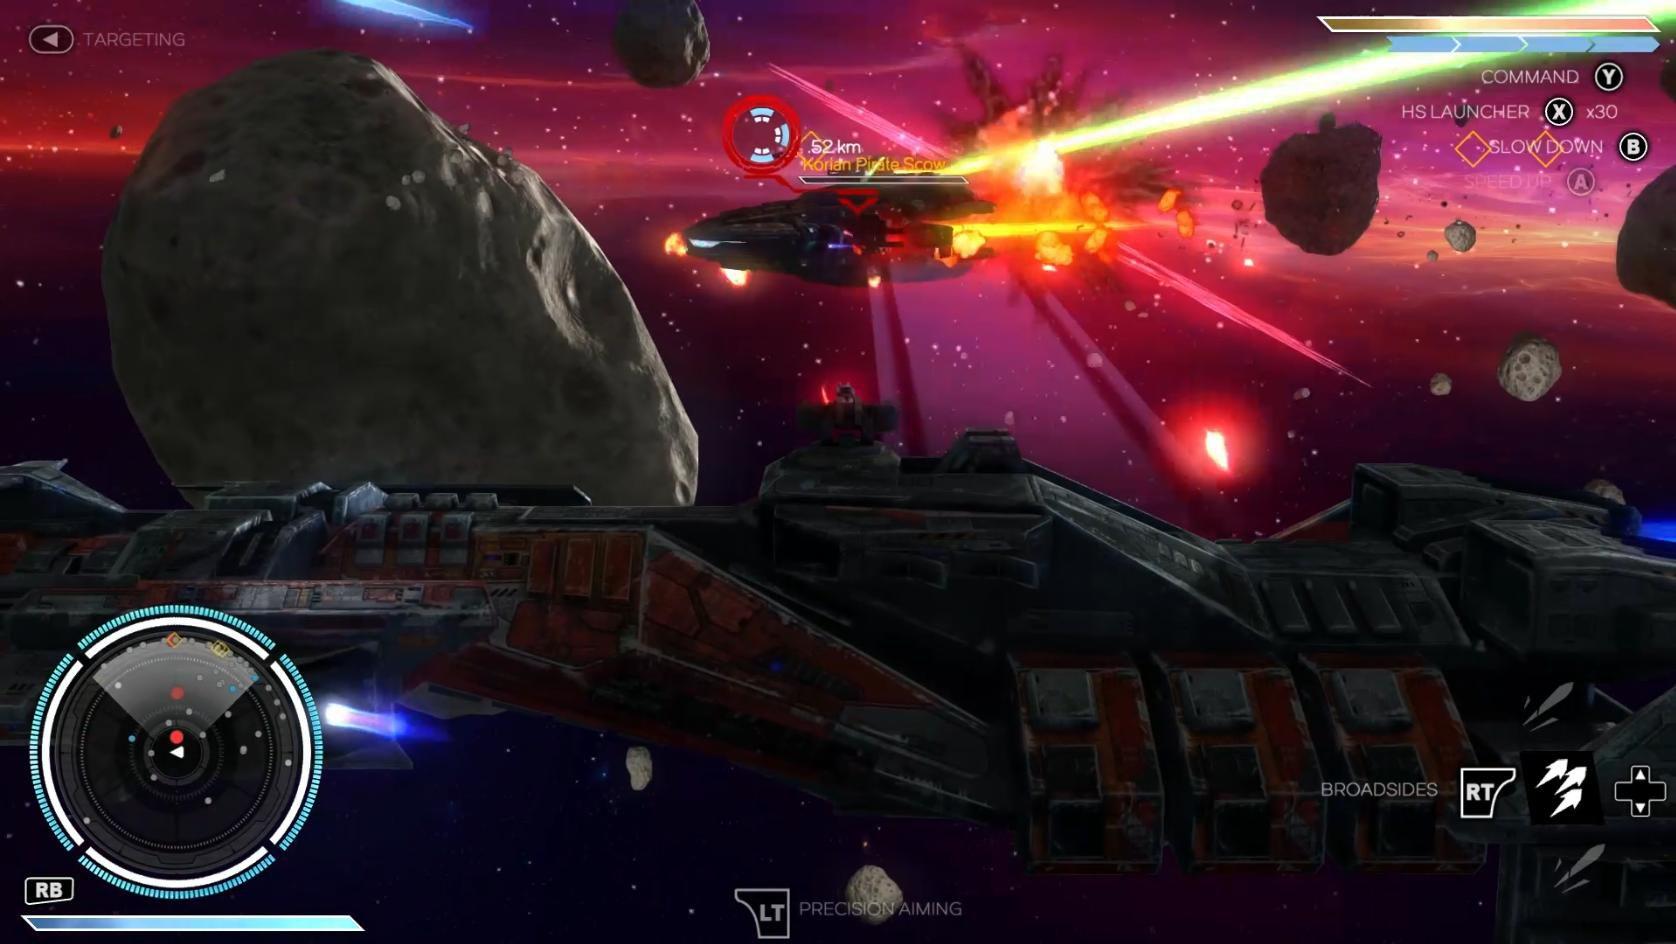 rebel_galaxy_broadside